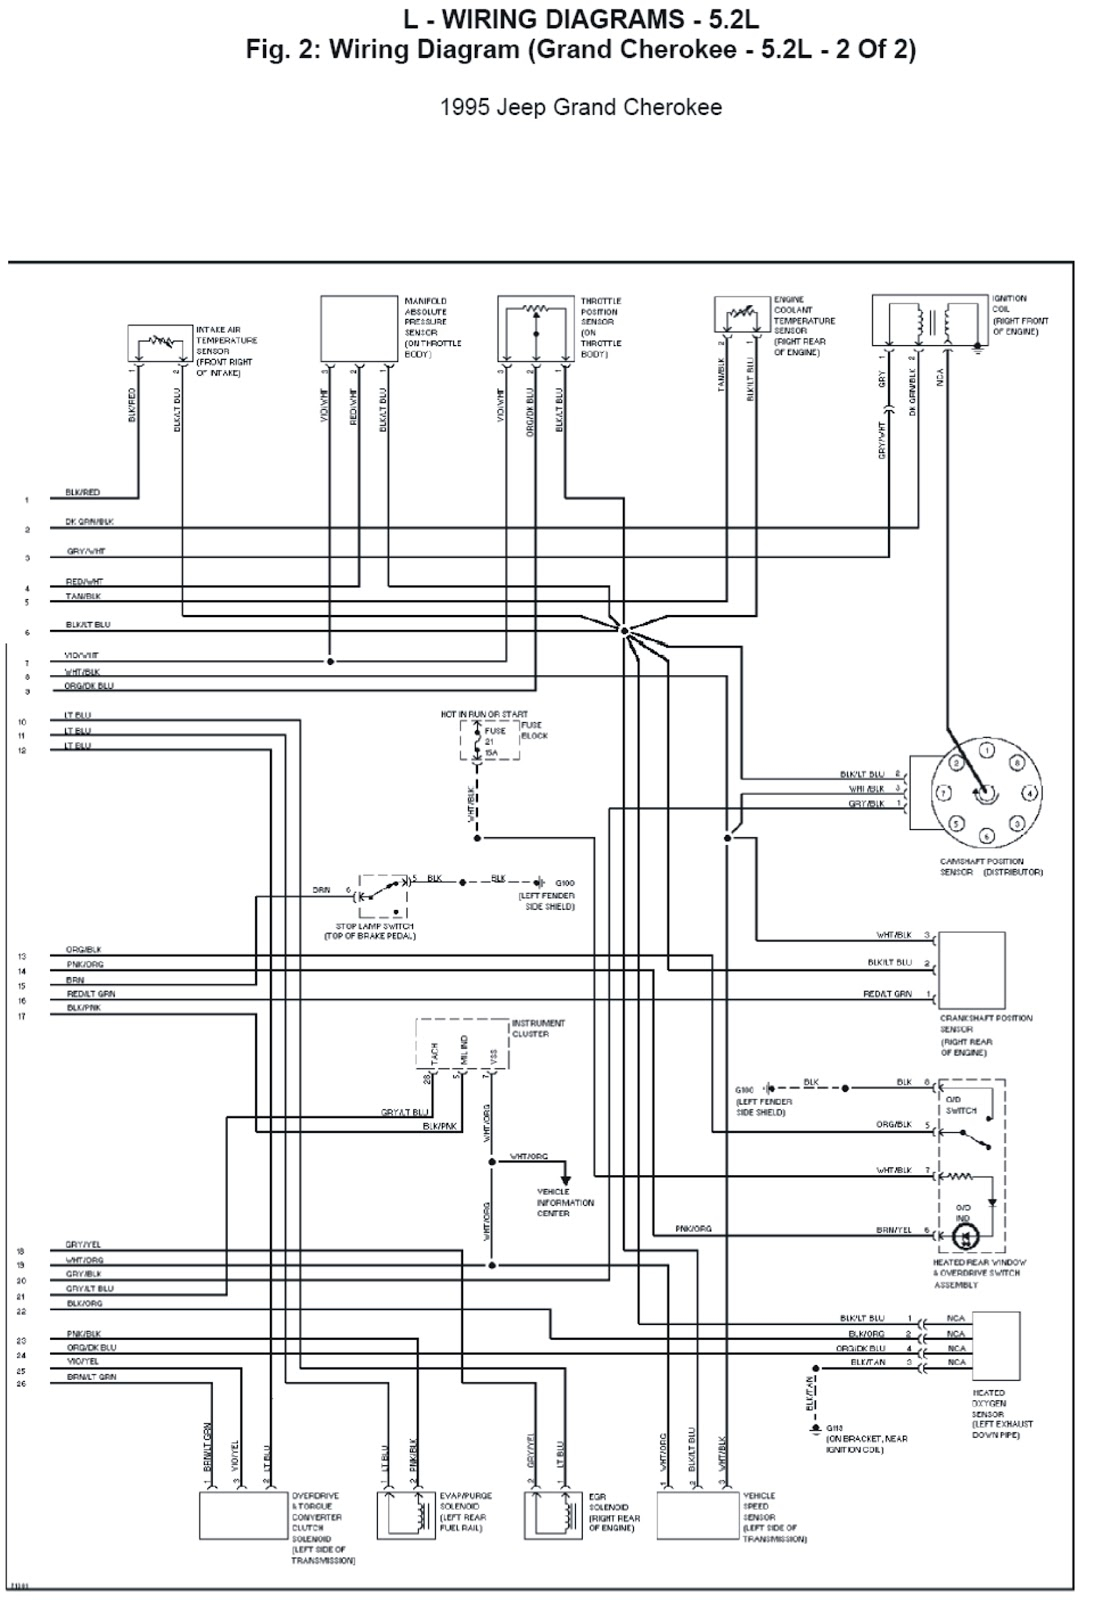 1998 Jeep Cherokee Trailer Wiring Diagram